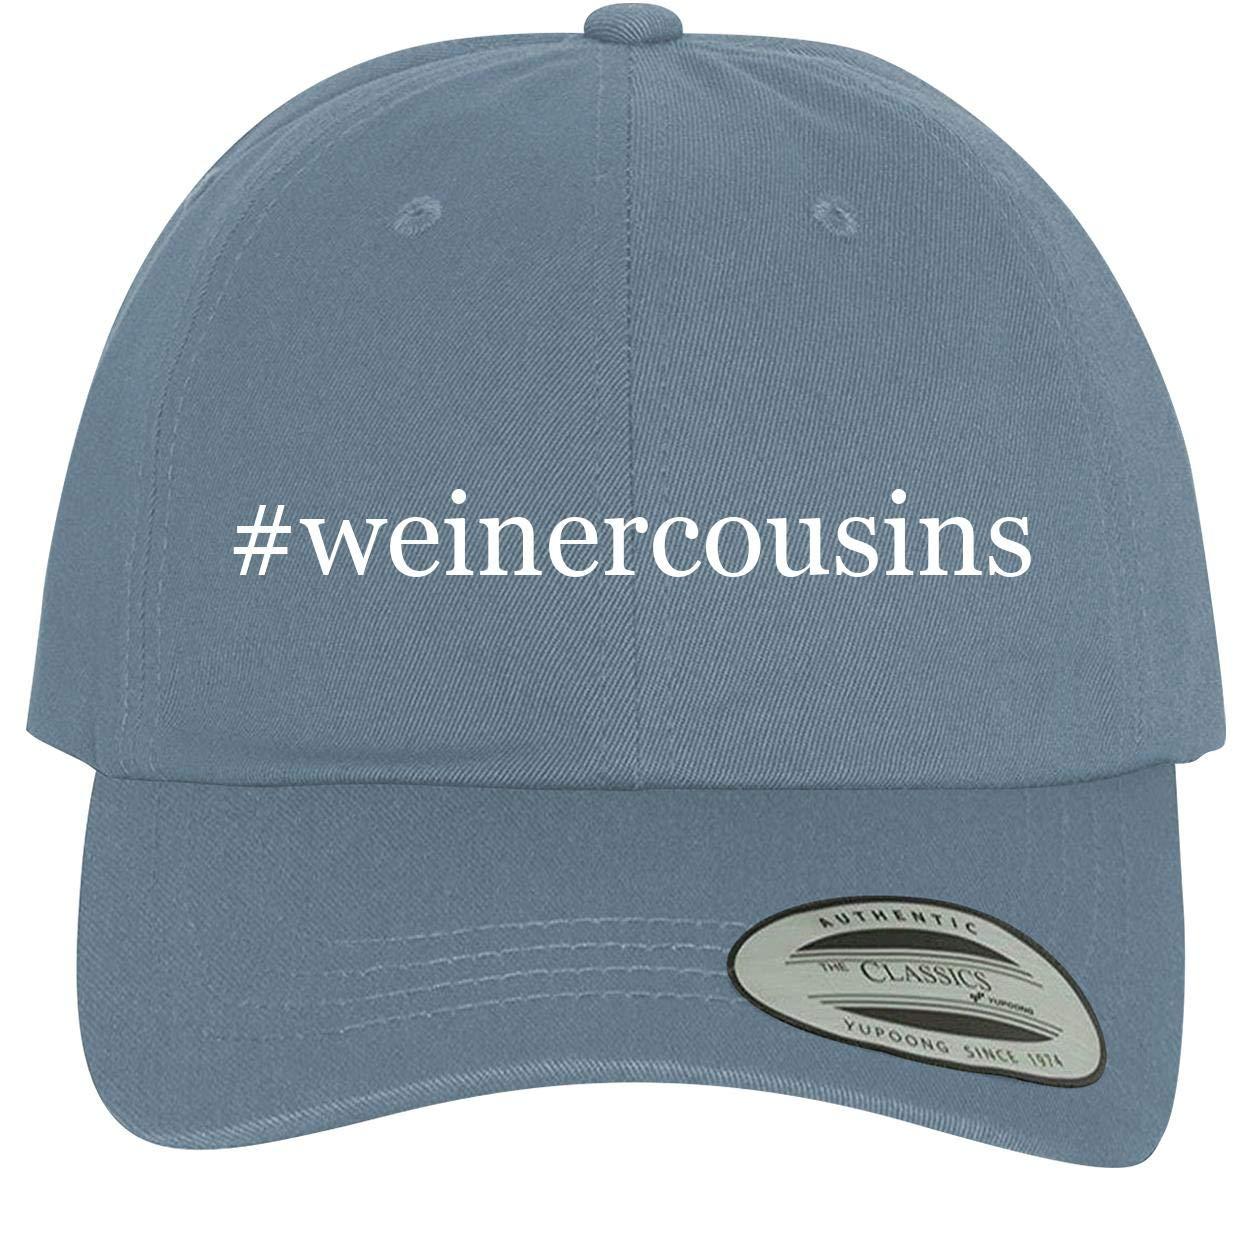 Comfortable Dad Hat Baseball Cap BH Cool Designs #weinercousins